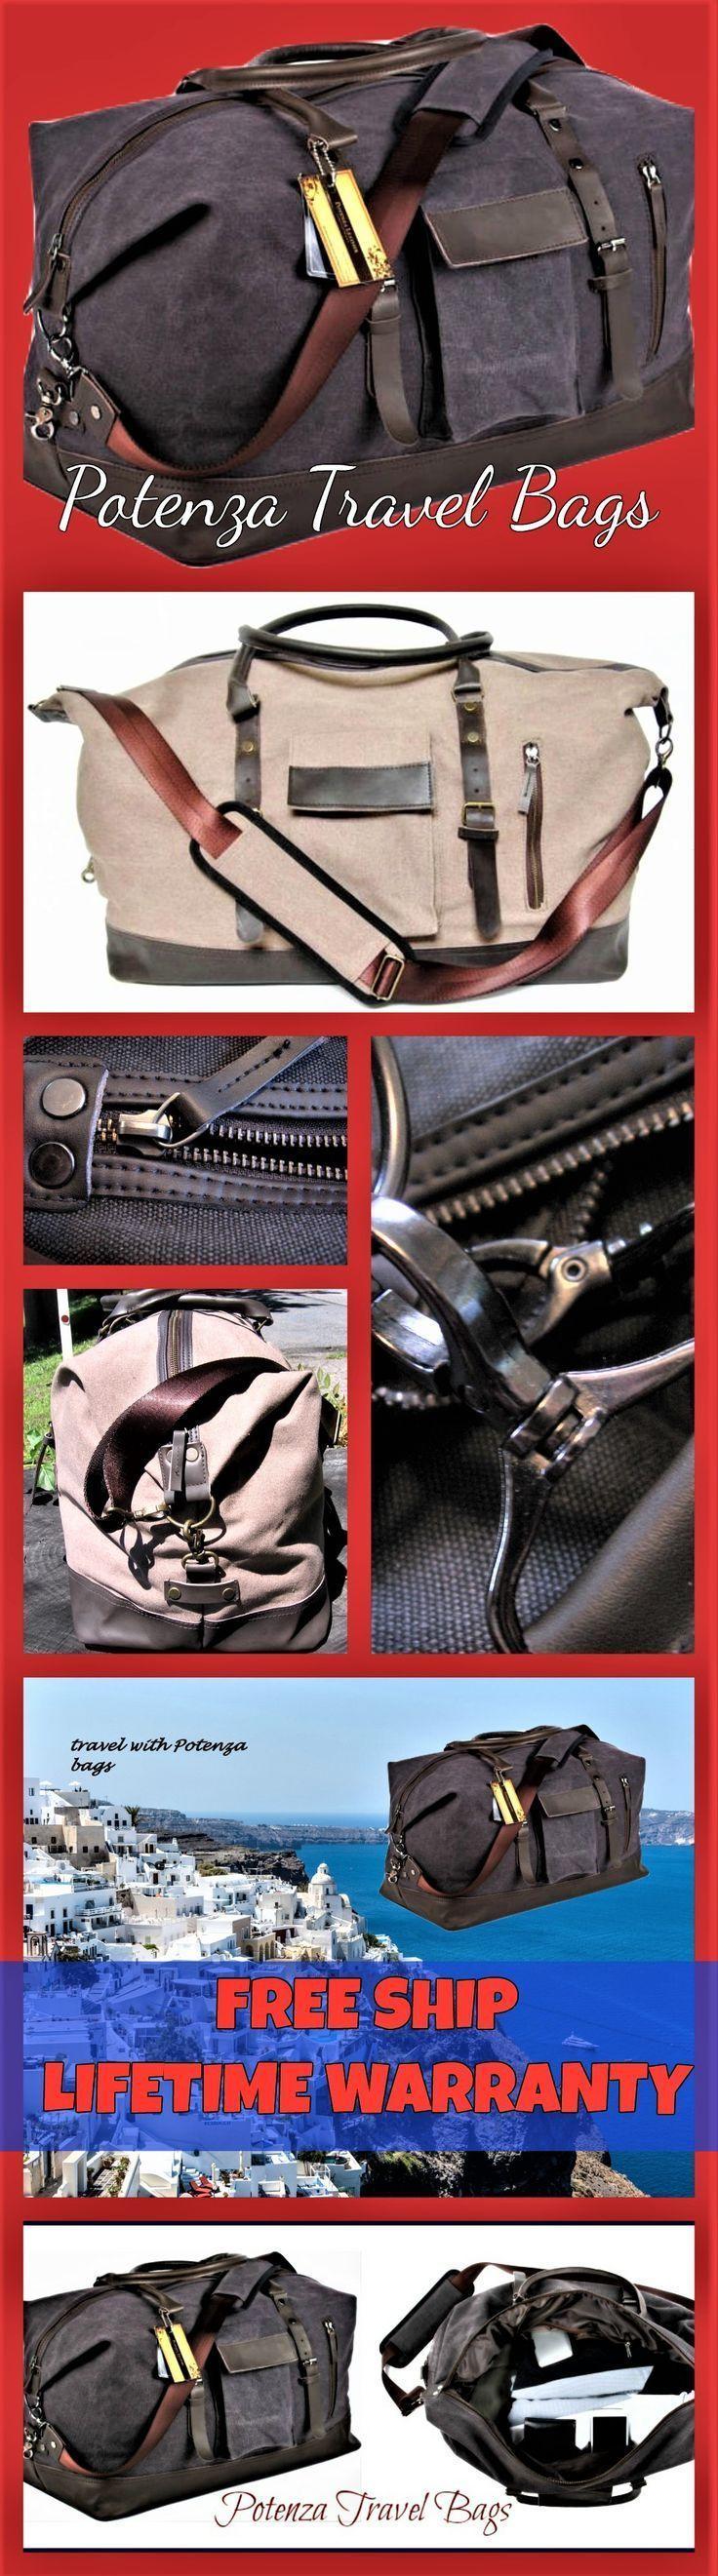 Duffle bags travel bags for men women, Leather duffle bag, large Can be used as a duffle bag travel bag or ovenight bag. #Travelbagsforwomen